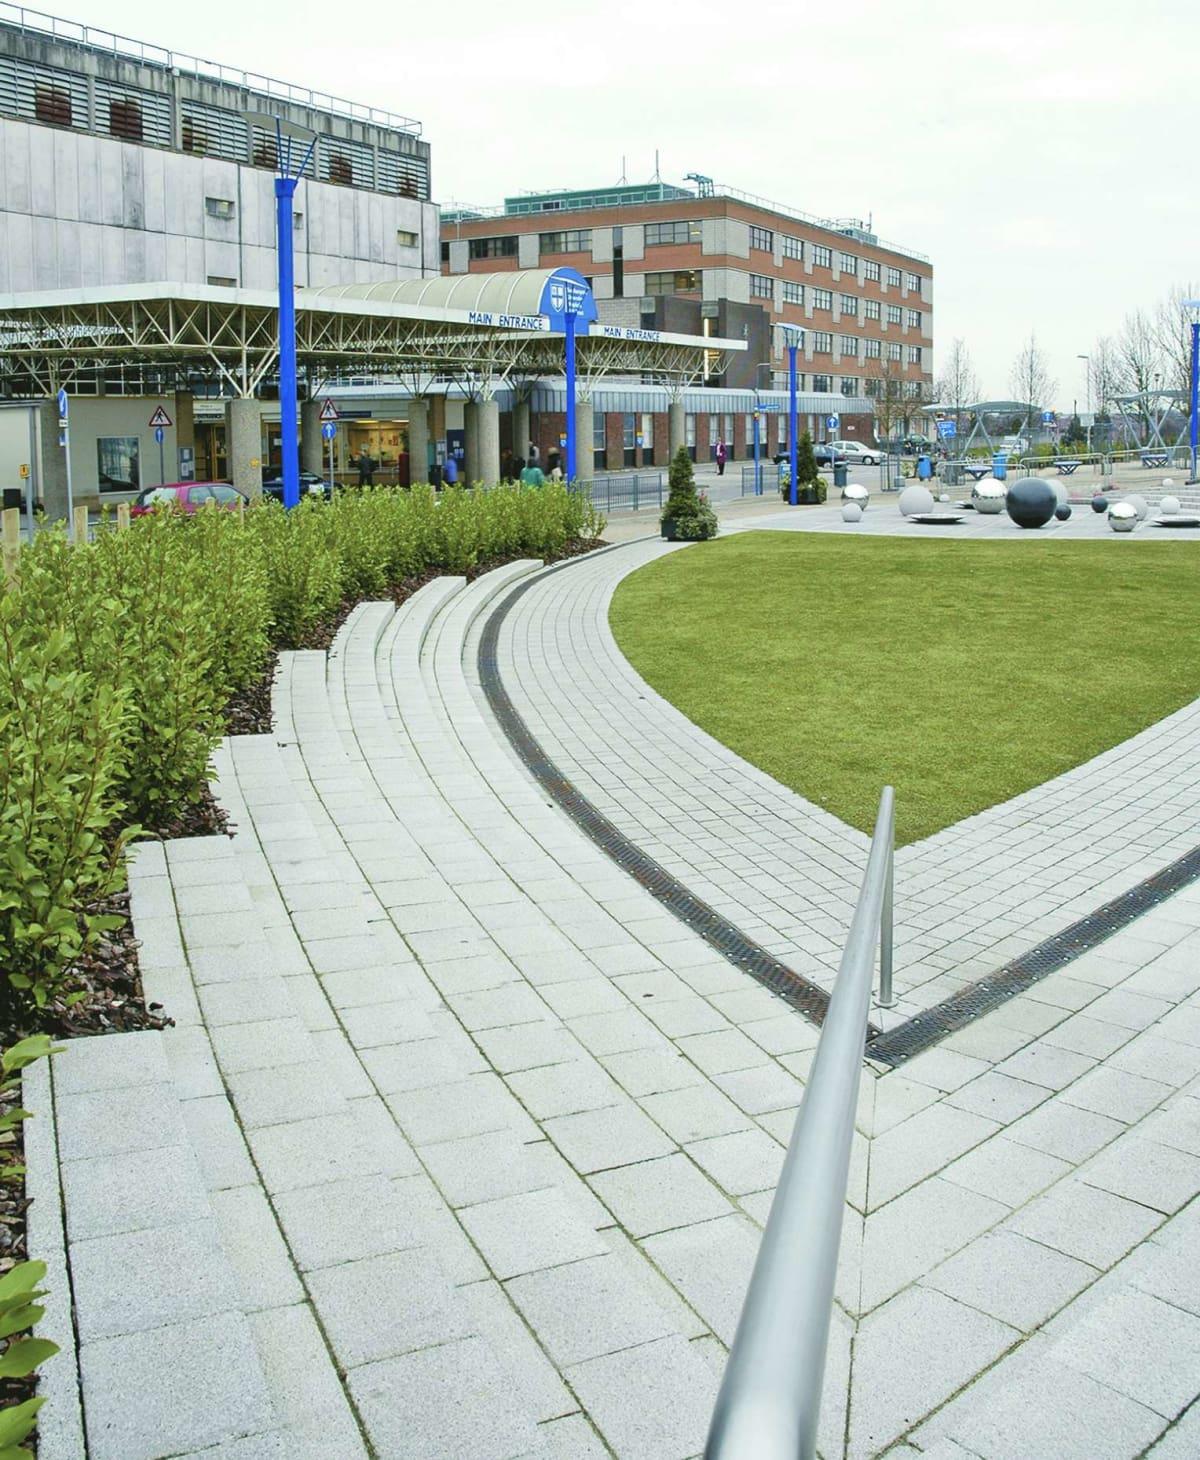 Southampton NHS General Hospital Piazza